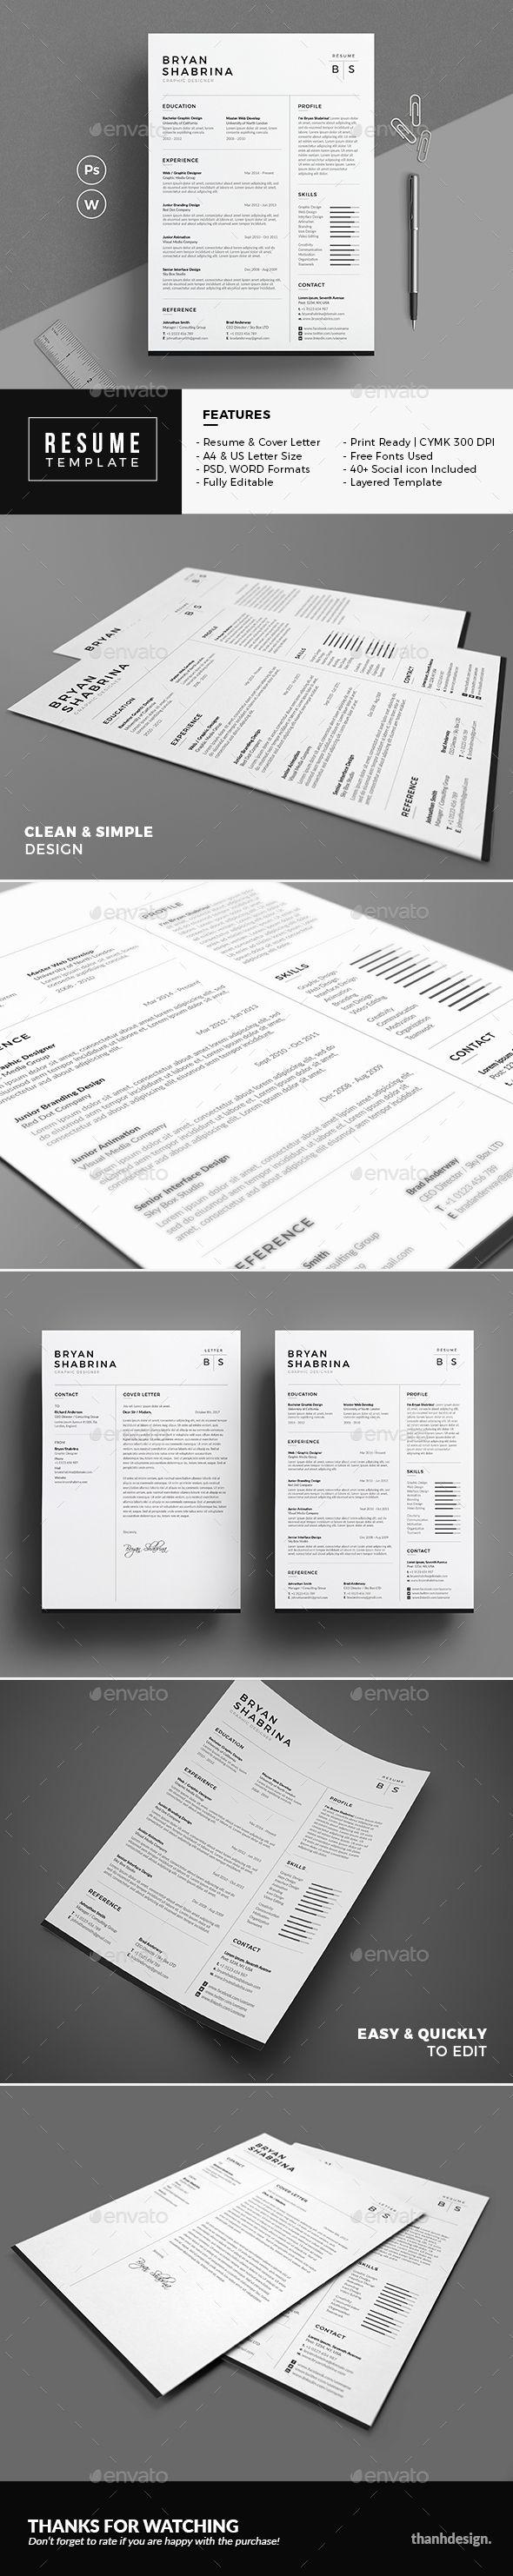 Resume Resume design template, Web design, Creative resume